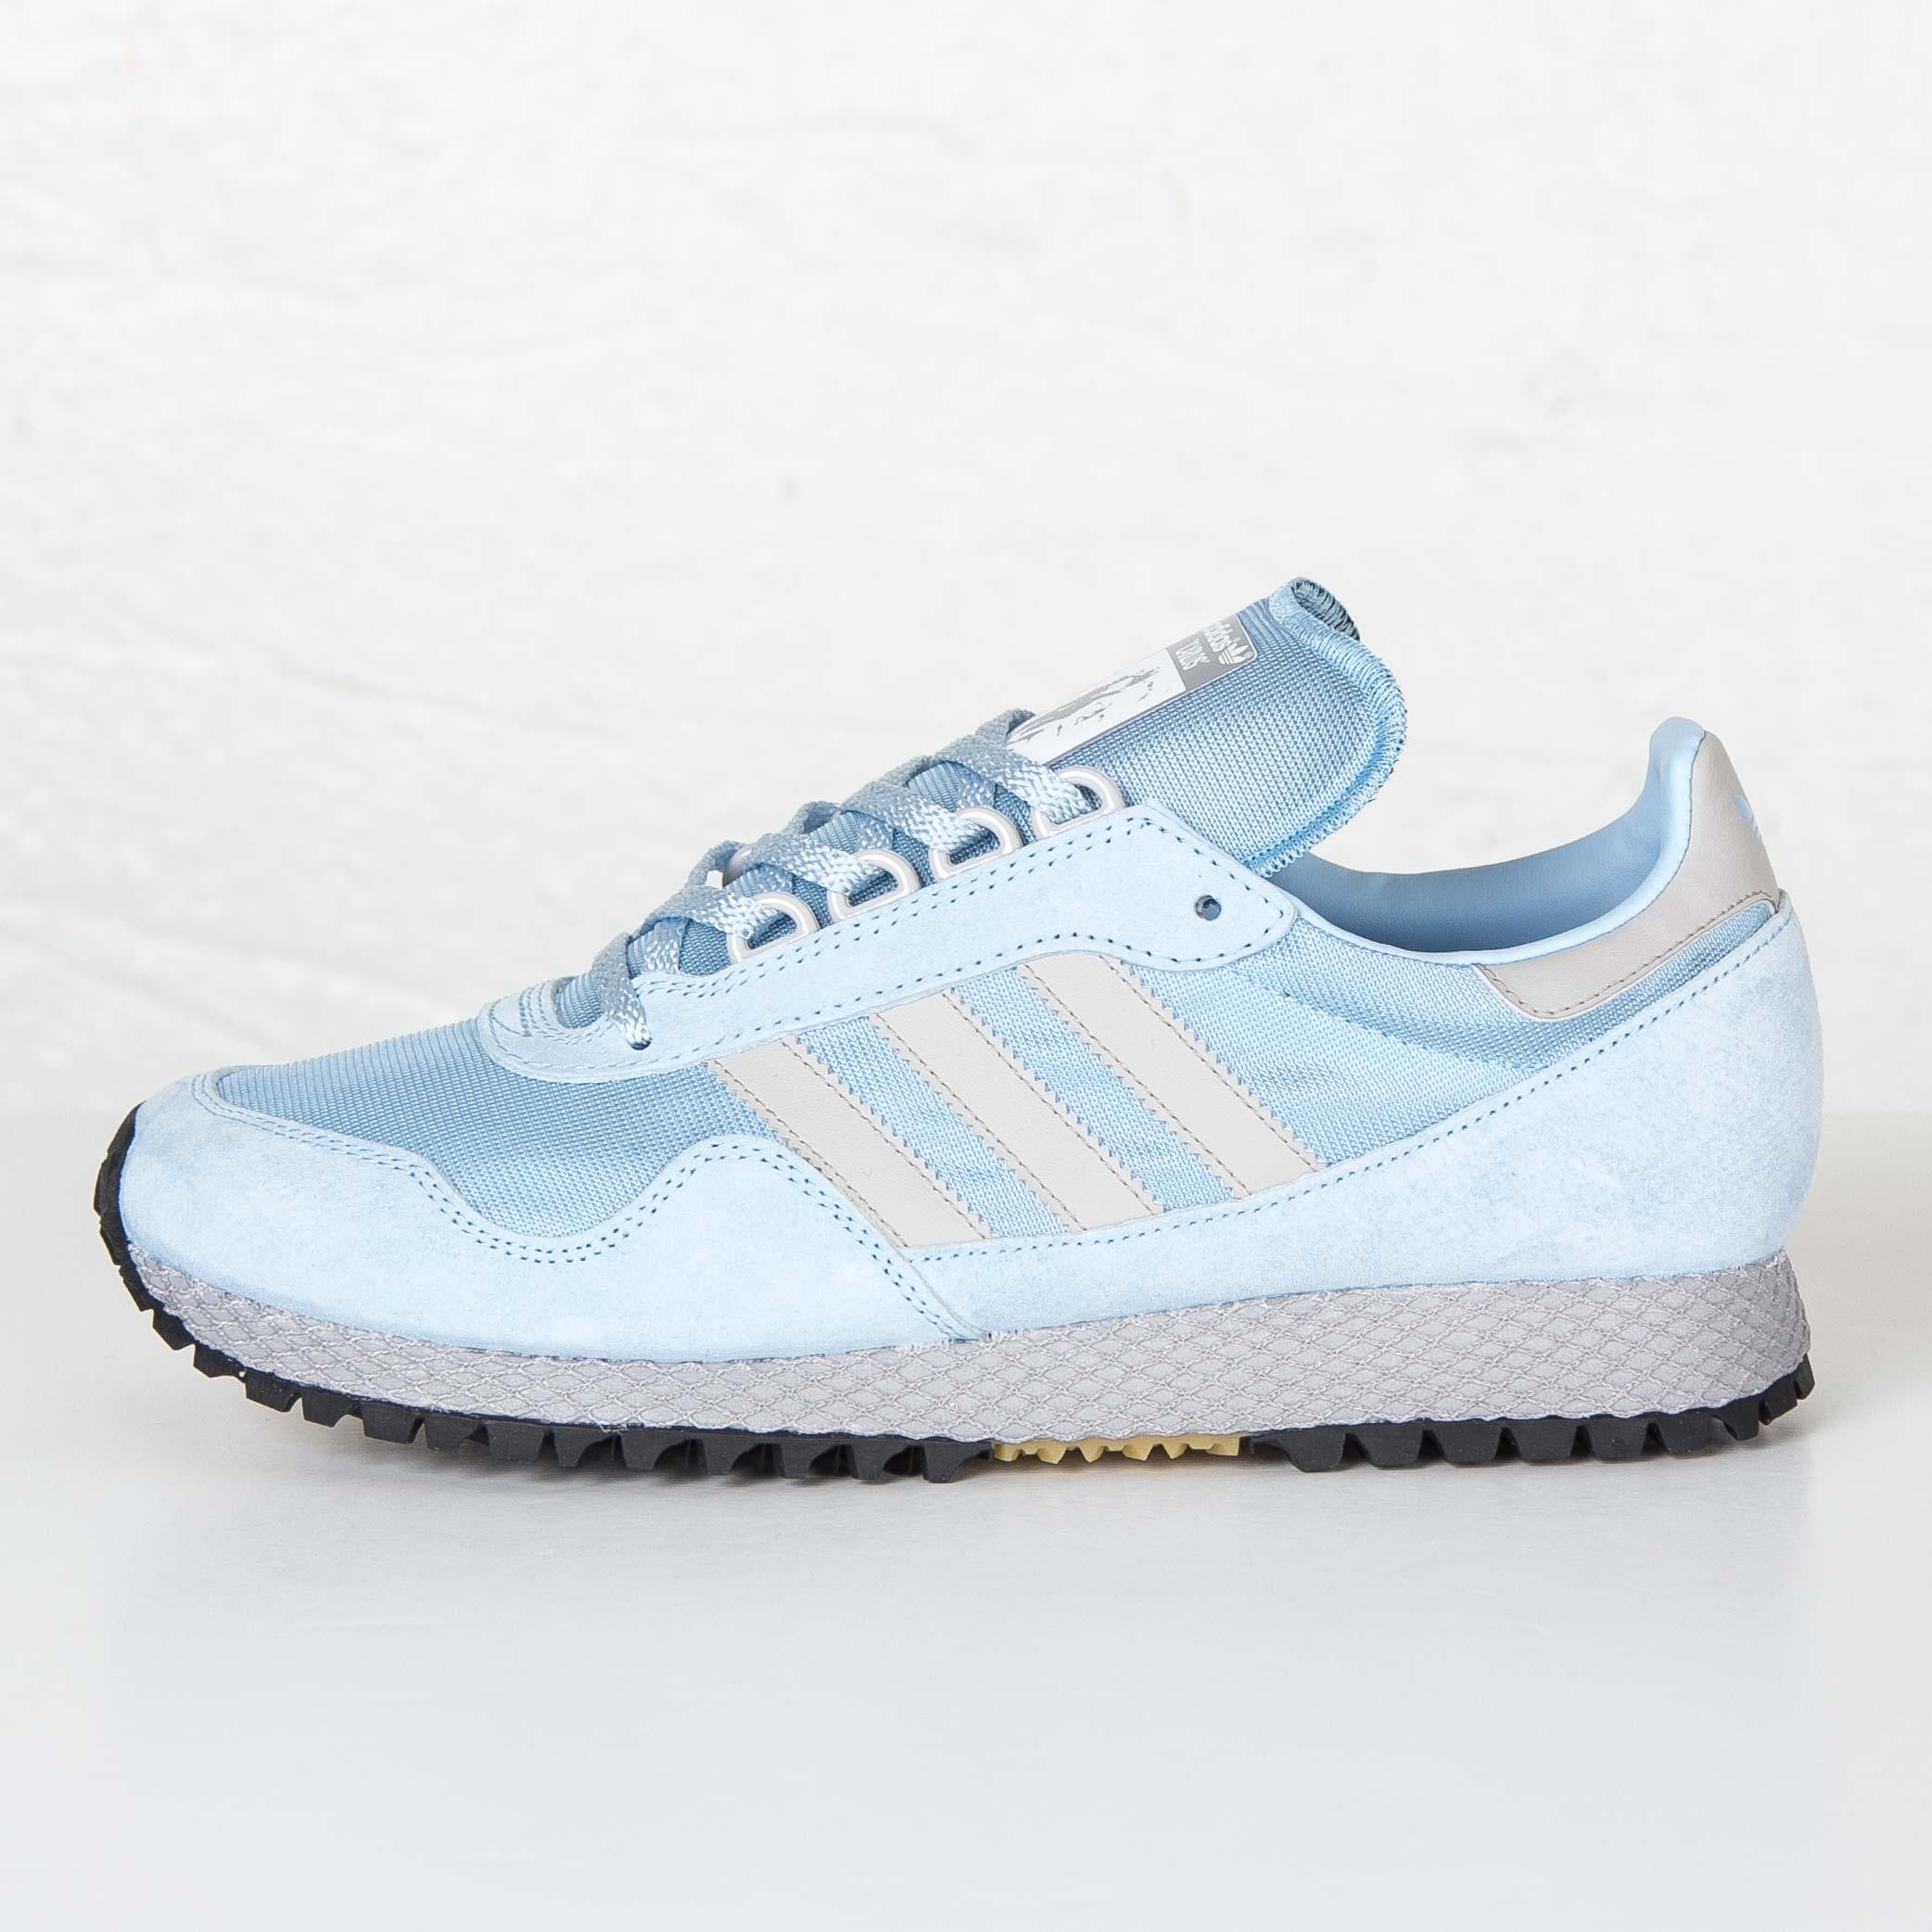 I Aq4808 New Sneakersnstuff SPZL adidas York Sneakers 8wOn0Pk